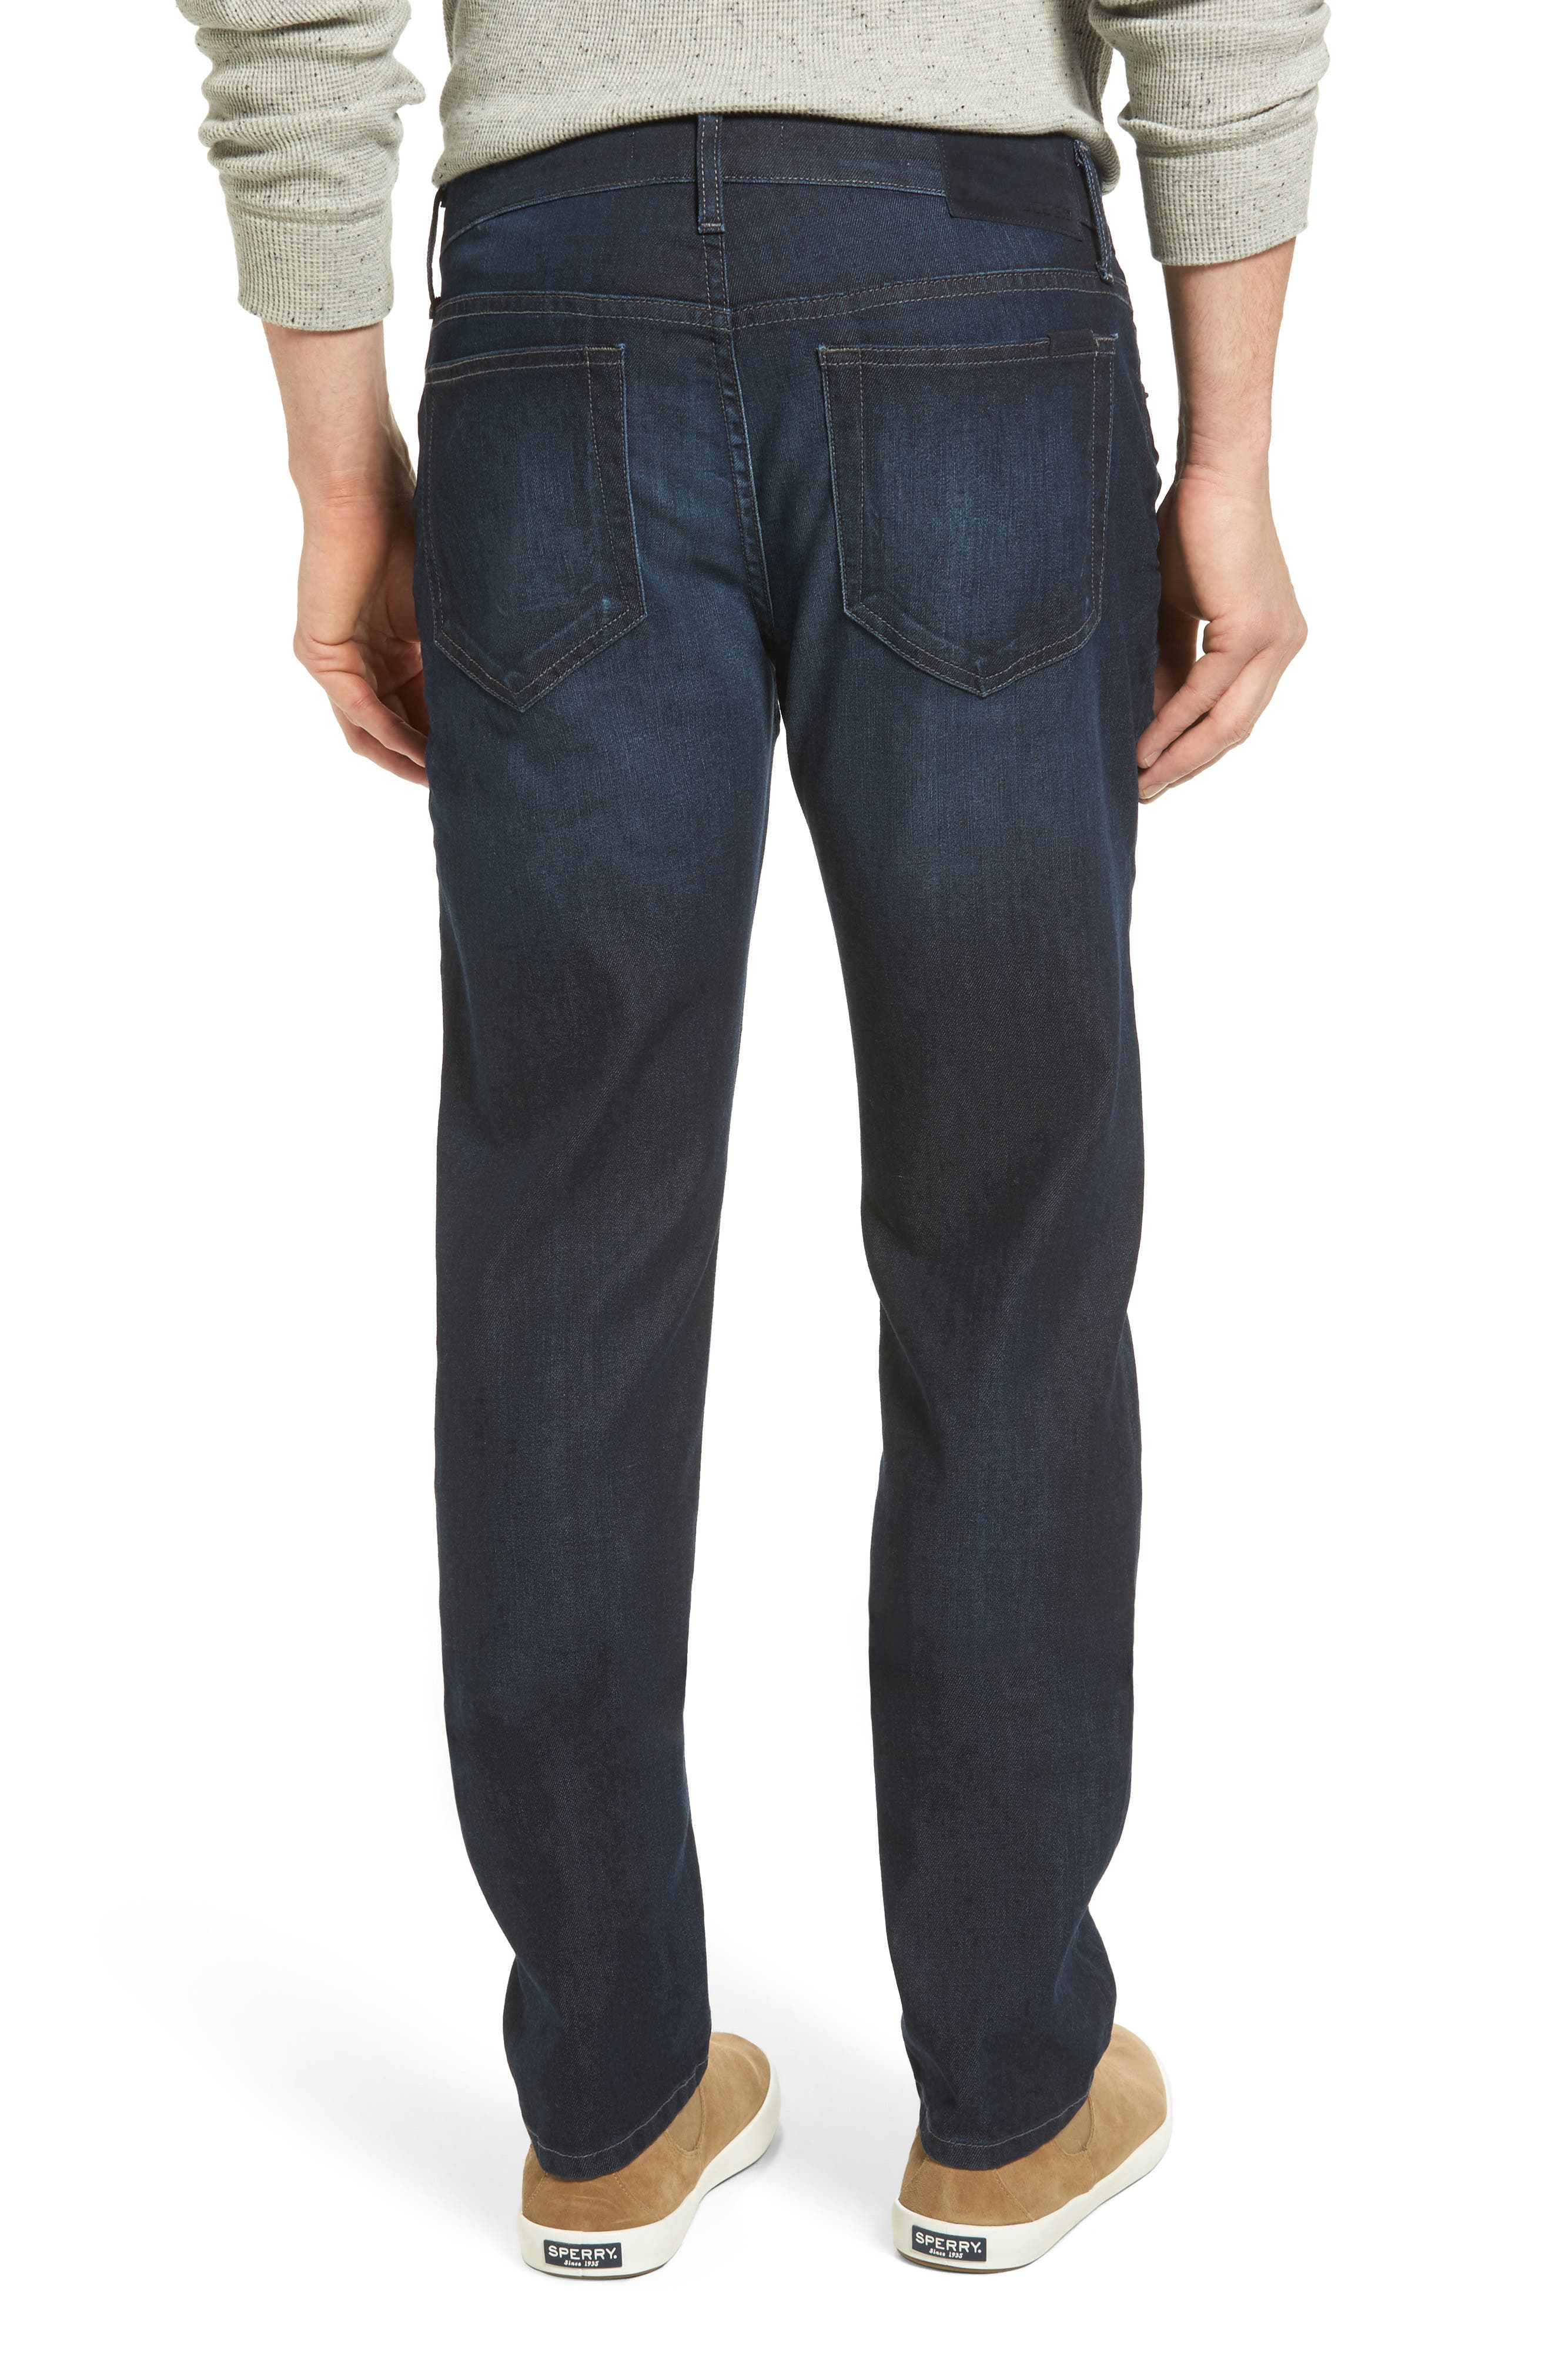 Brixton Slim Straight Leg Jeans,                             Alternate thumbnail 2, color,                             430